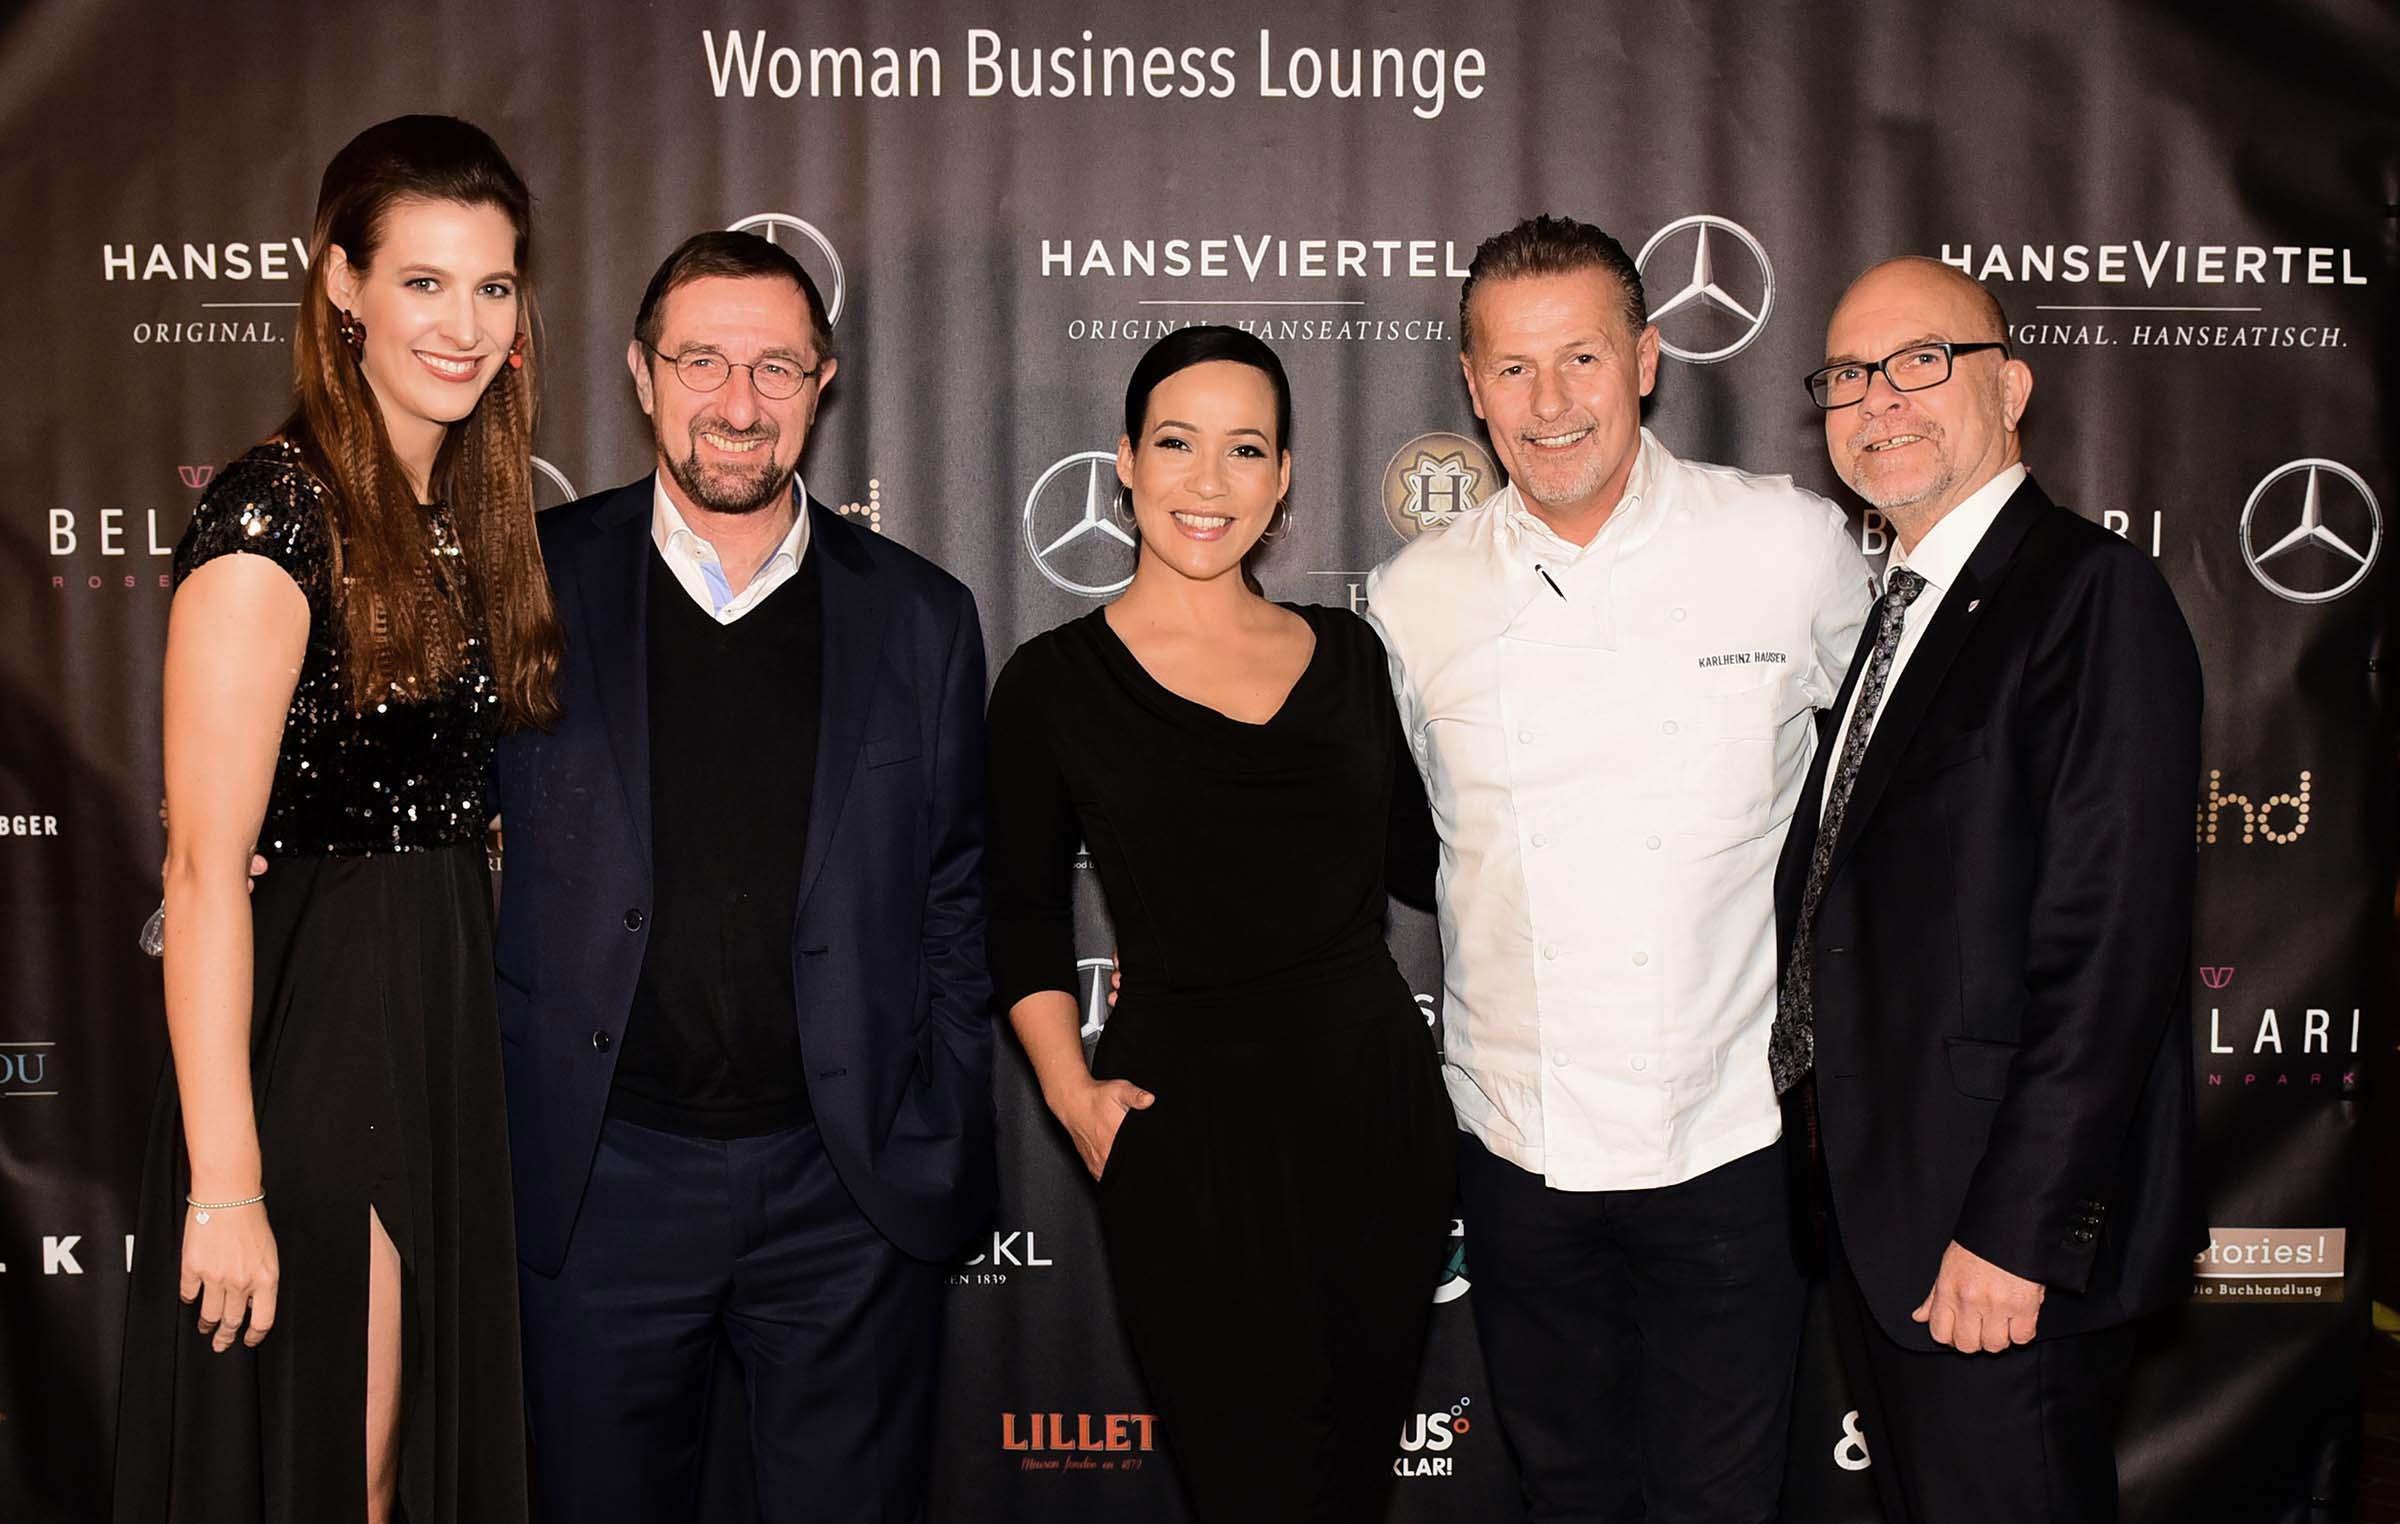 16. Woman Business Lounge im HanseViertel